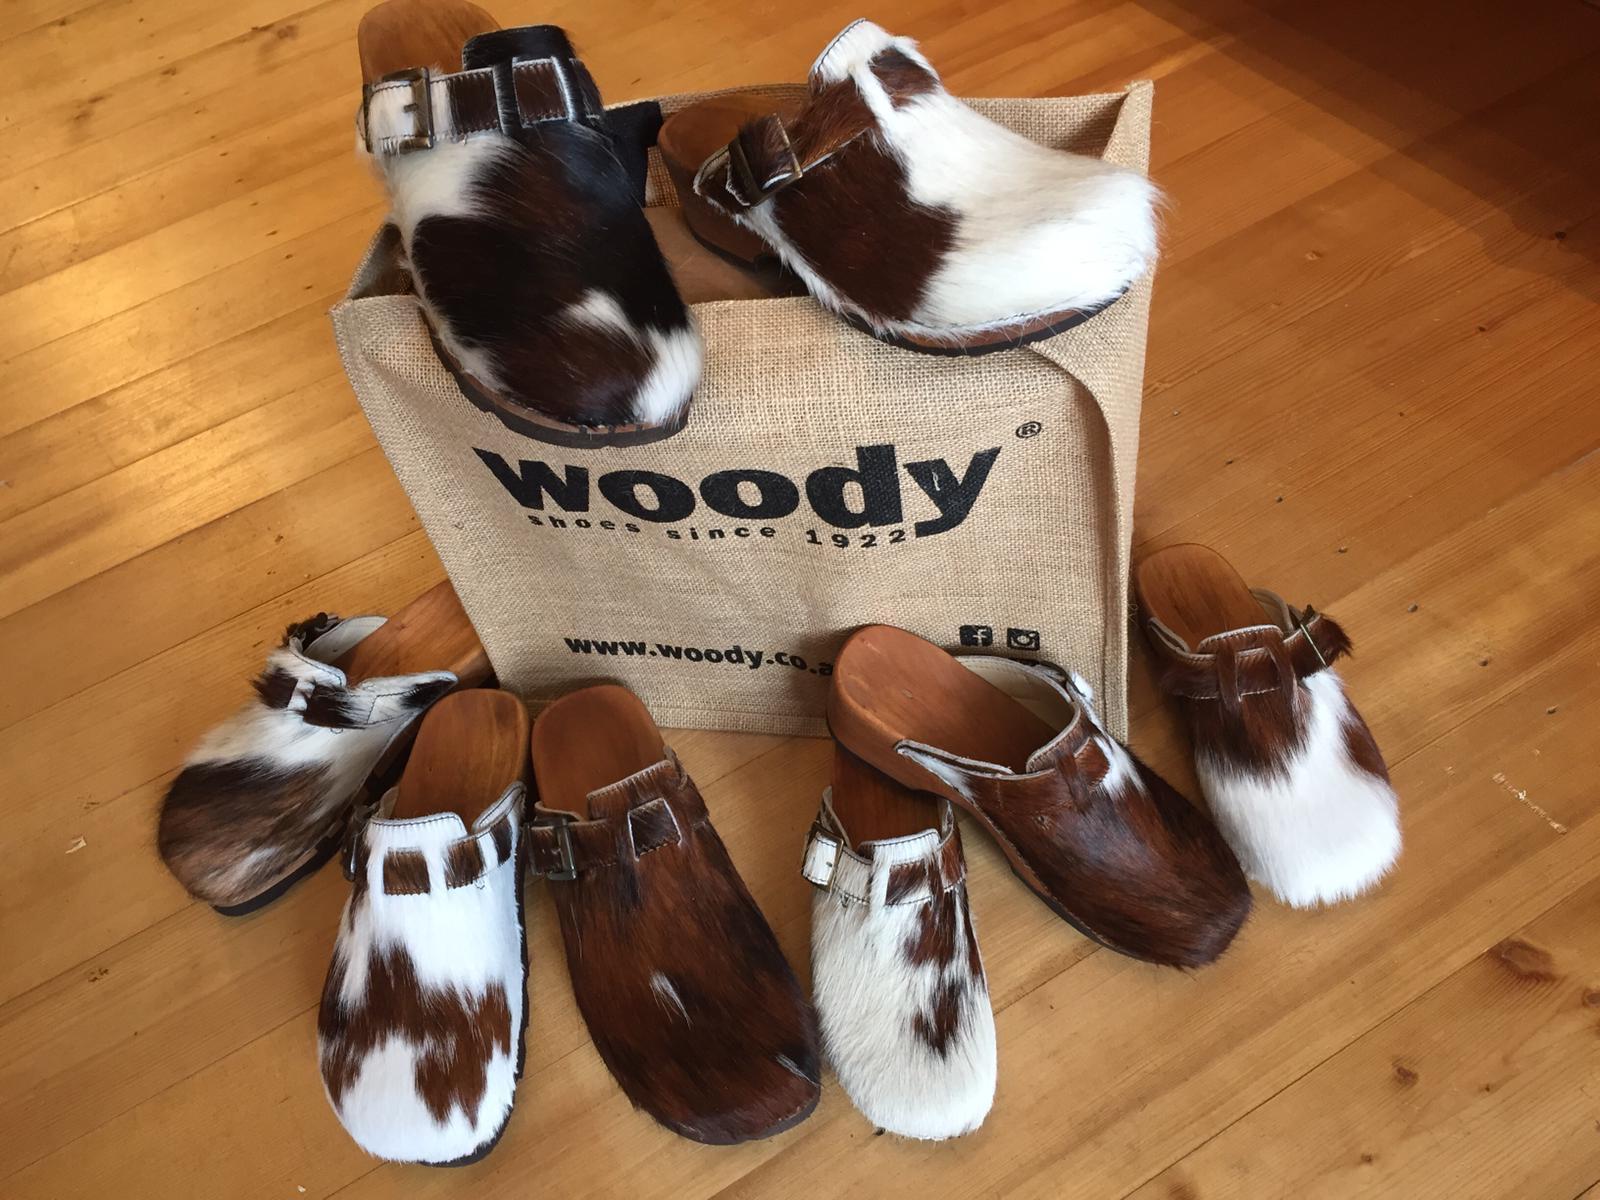 Woody Glocks